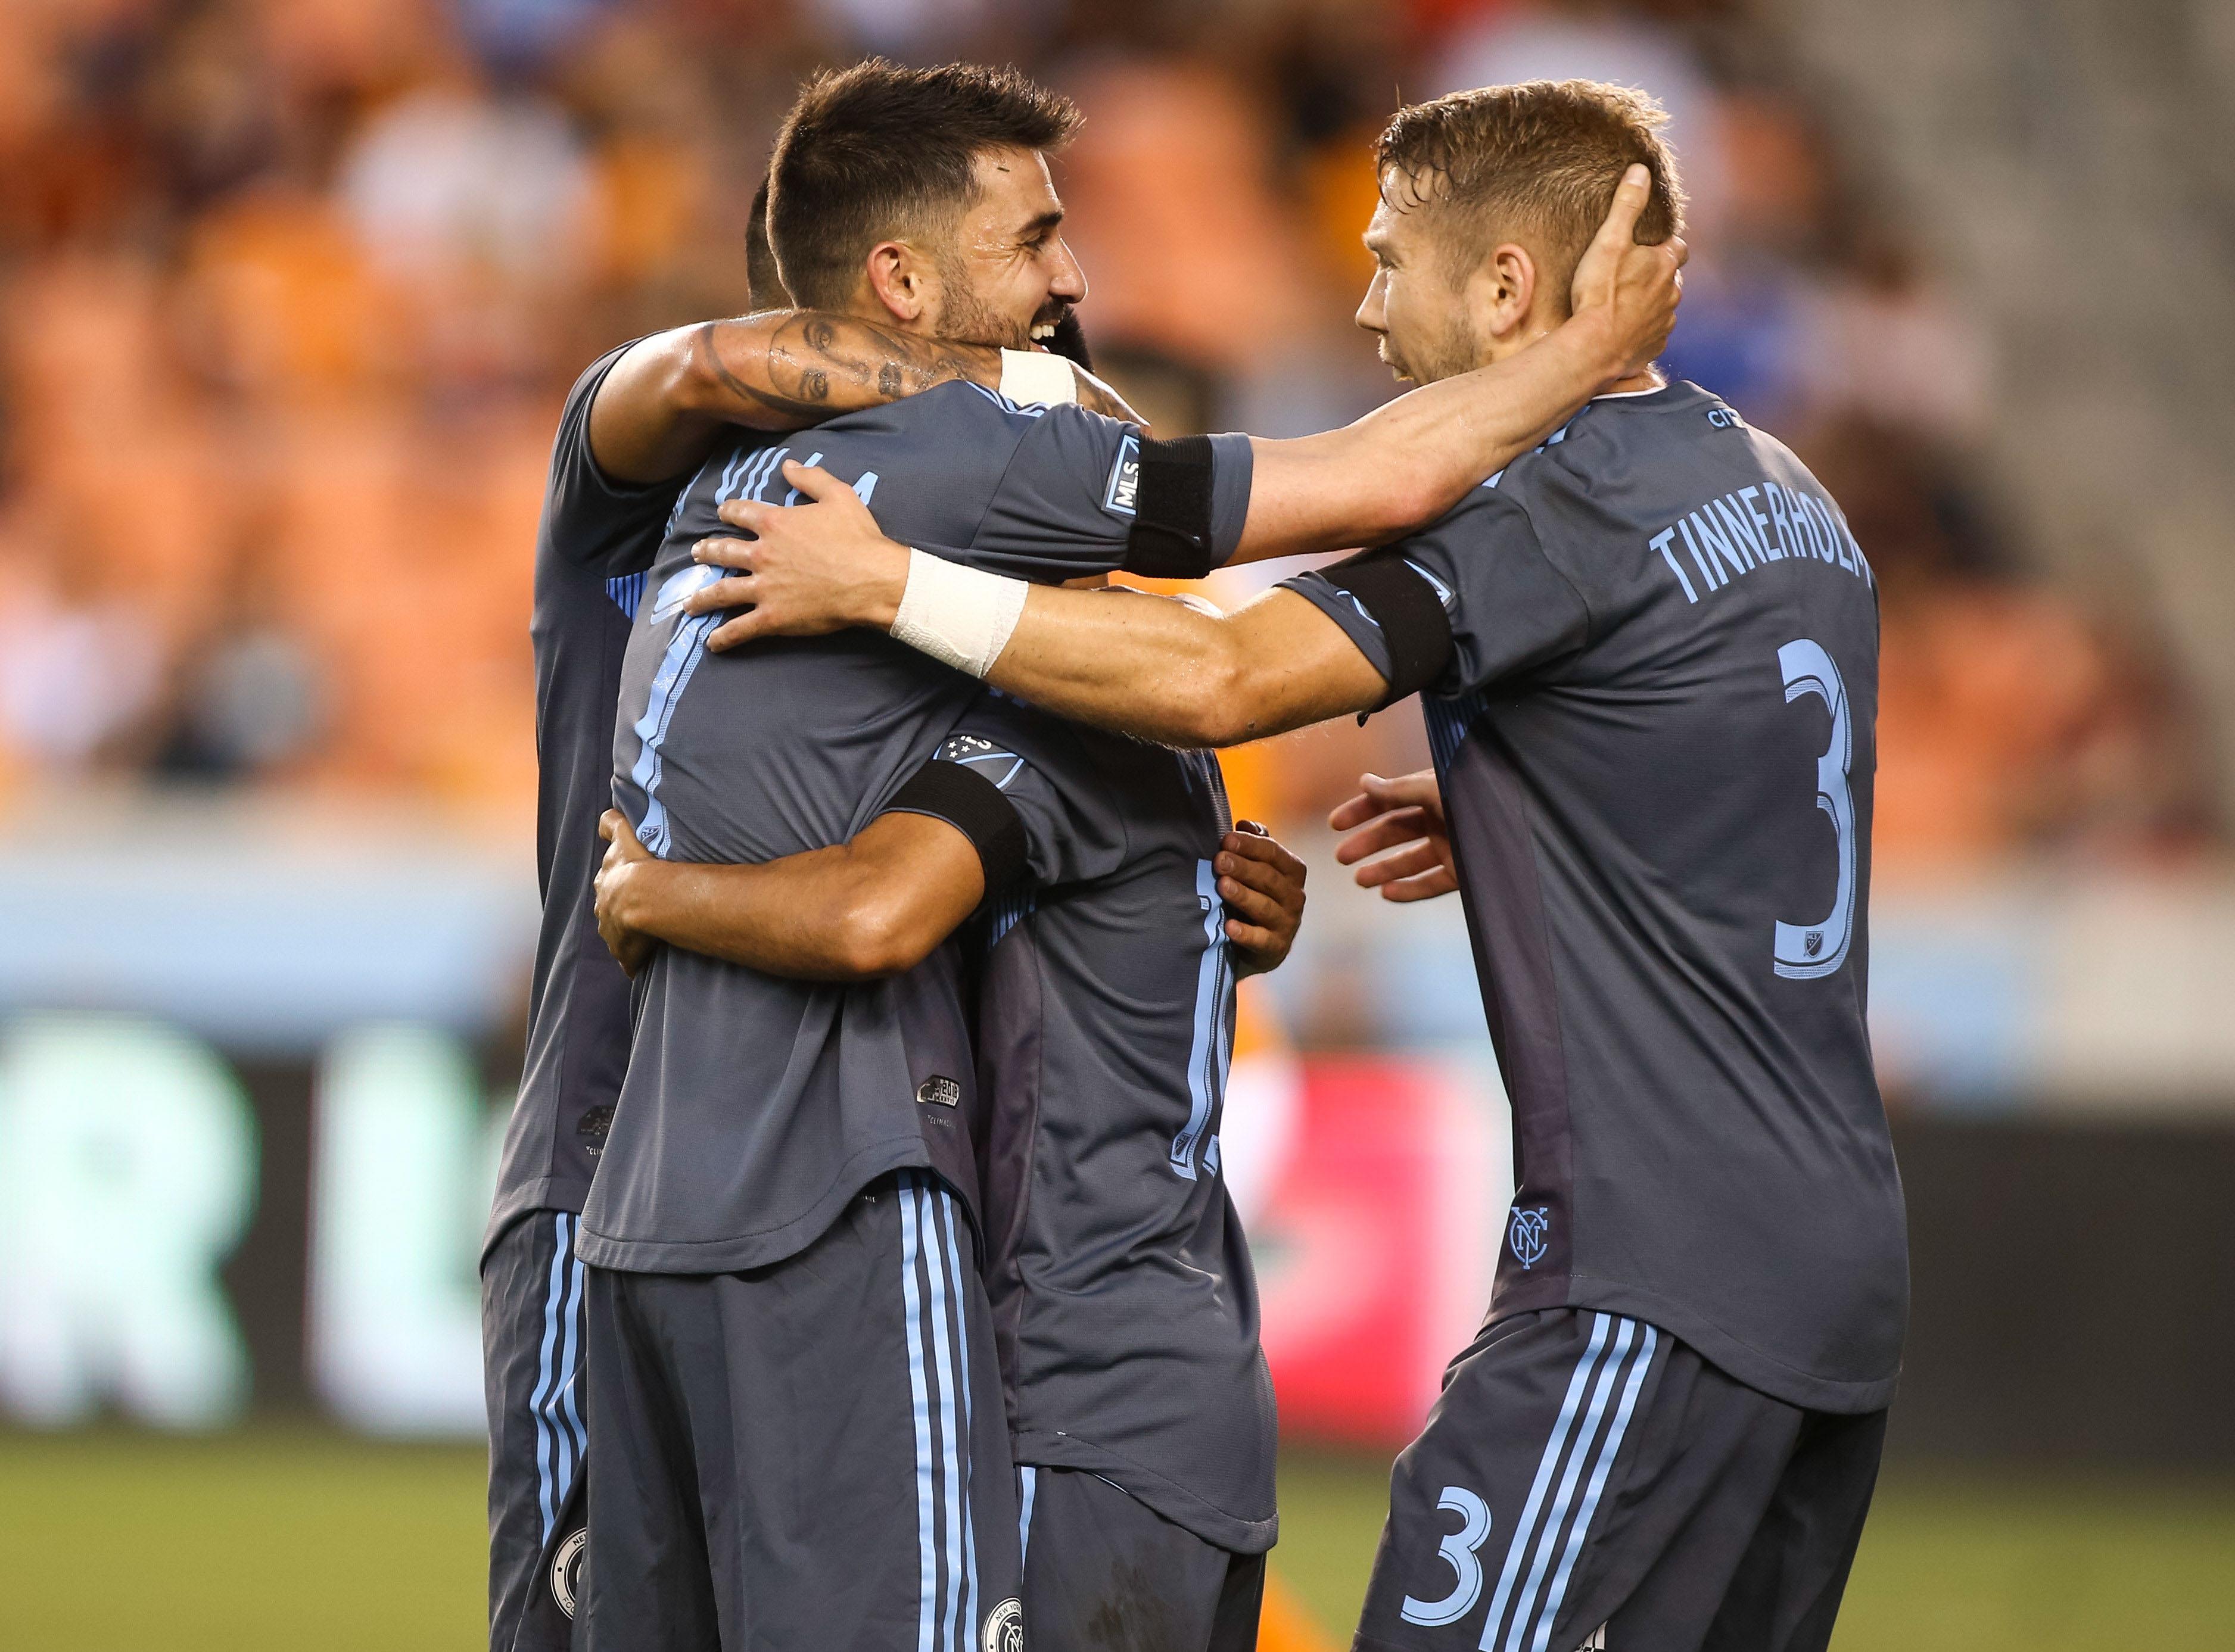 MLS: New York City FC at Houston Dynamo